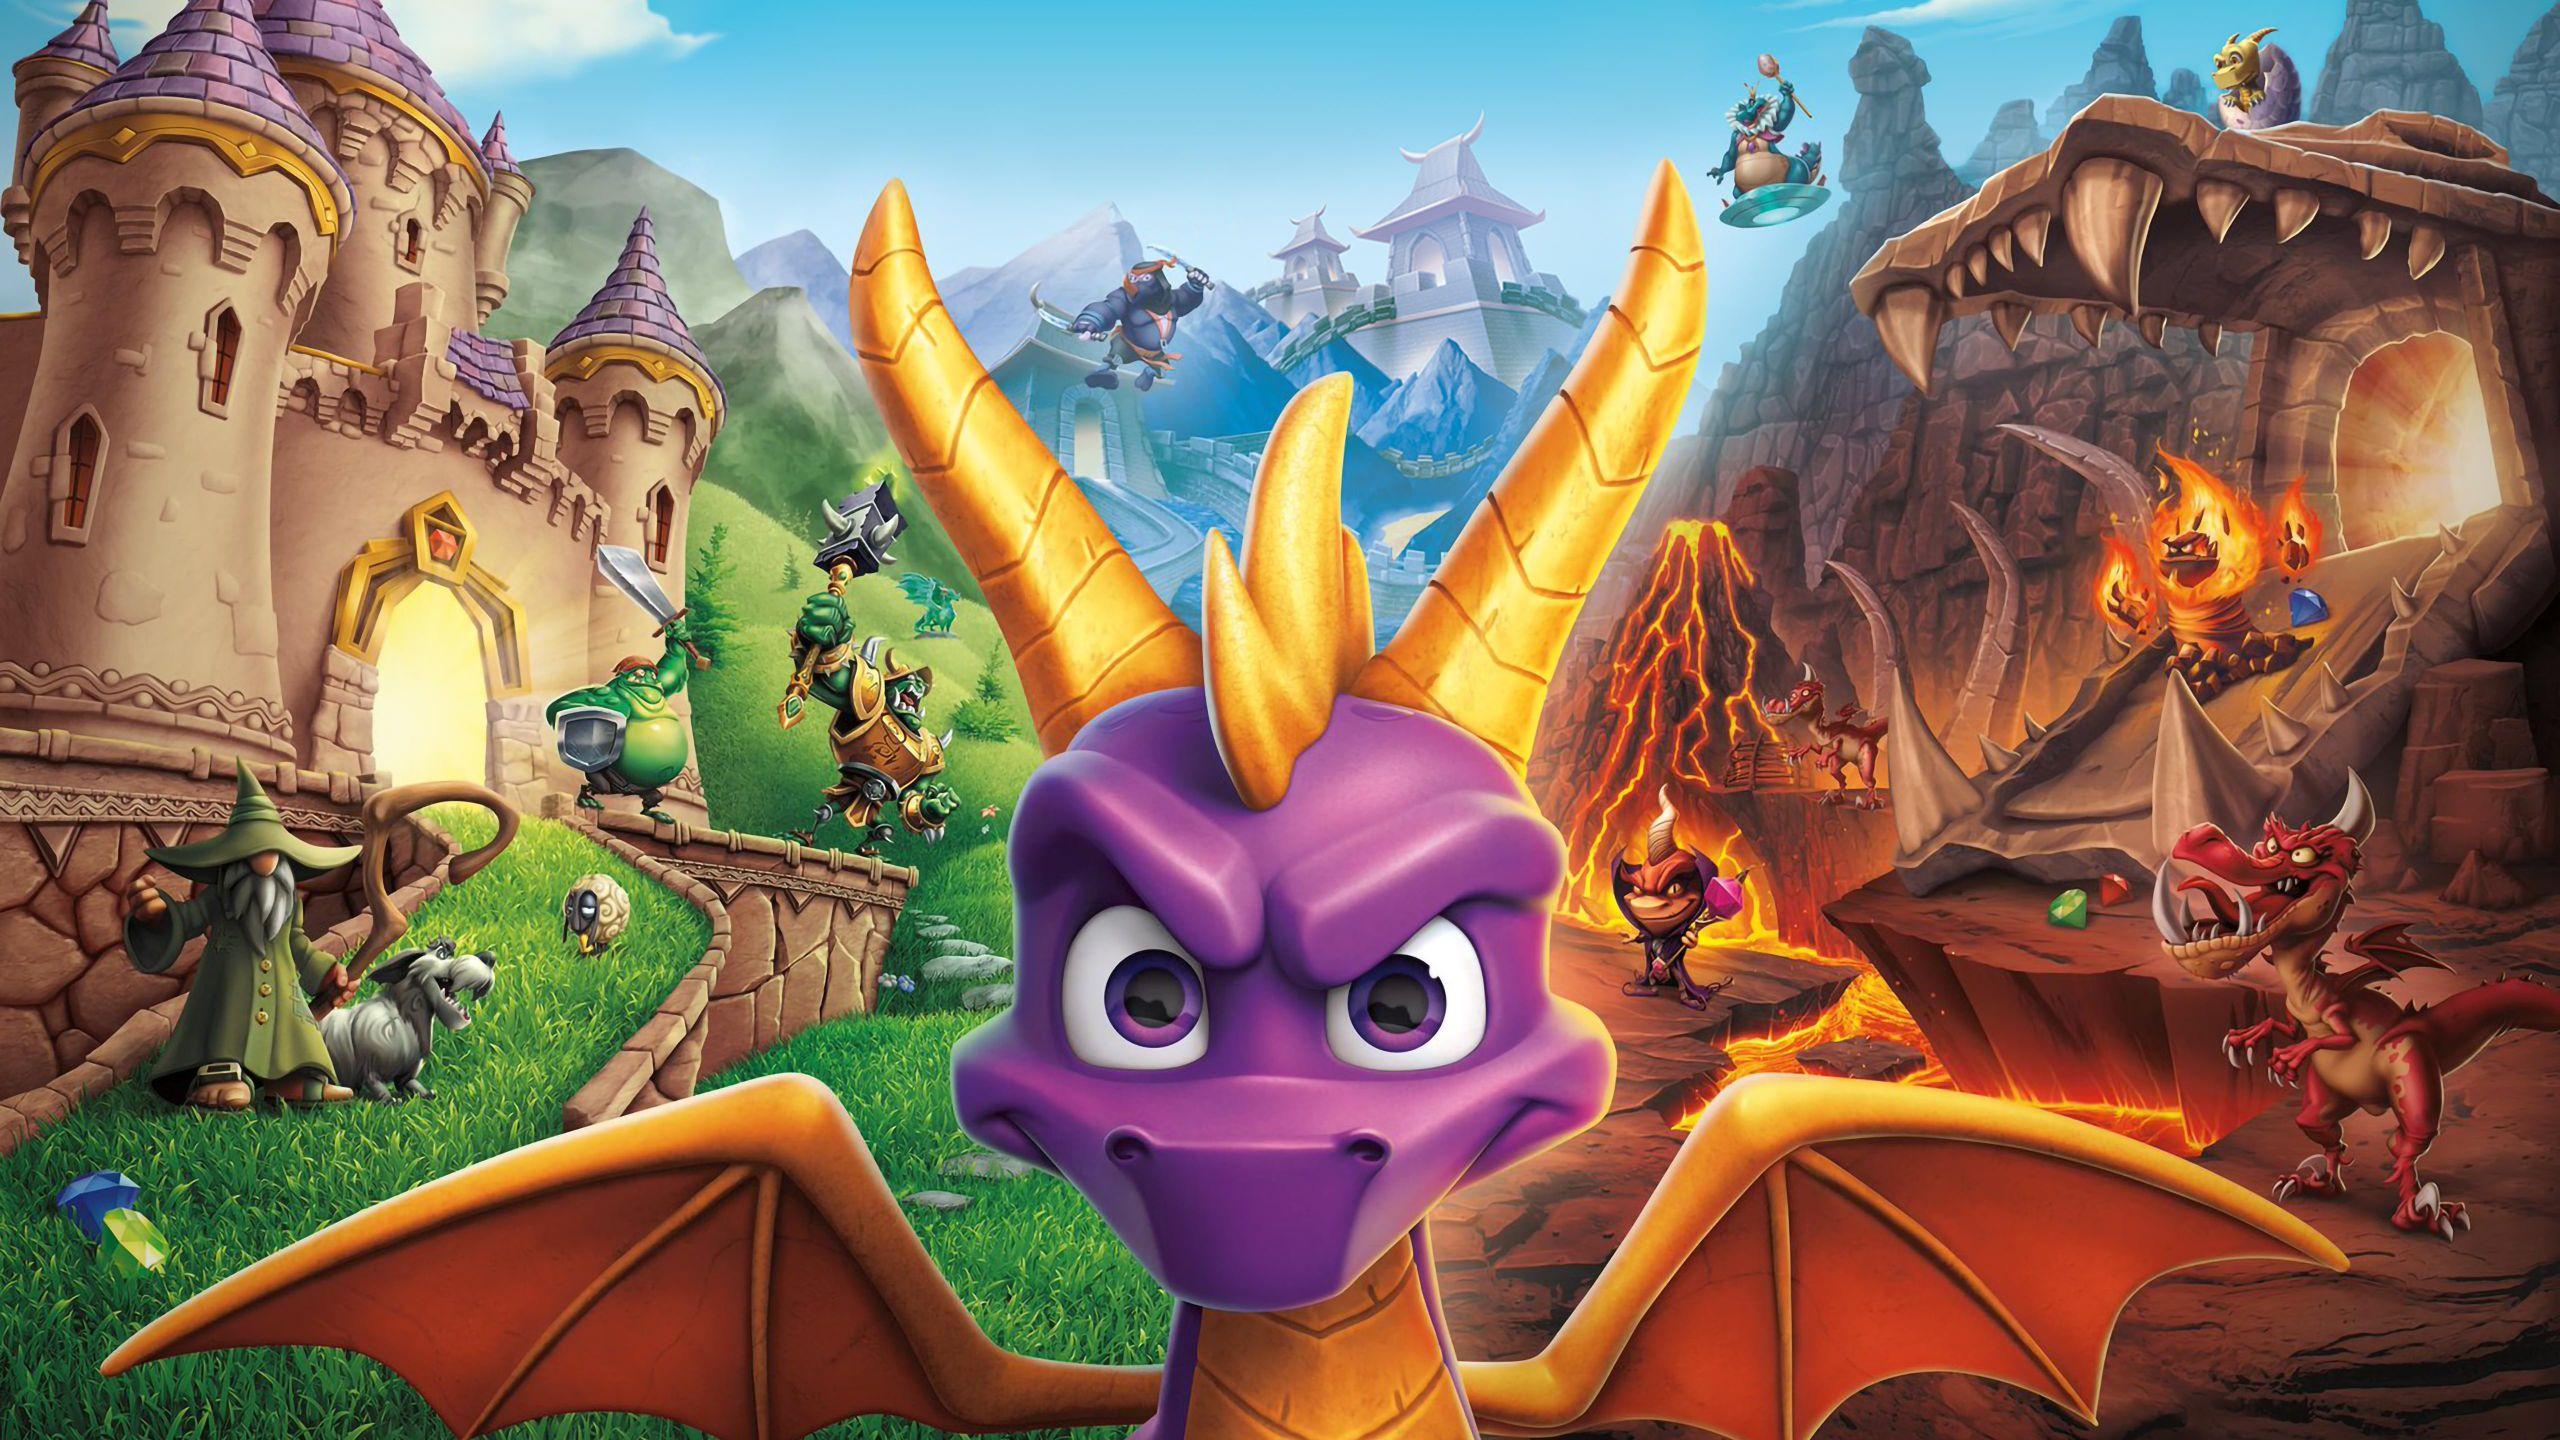 [Gamesflat] Spyro Reignited Trilogy (PS4/ XBOX)